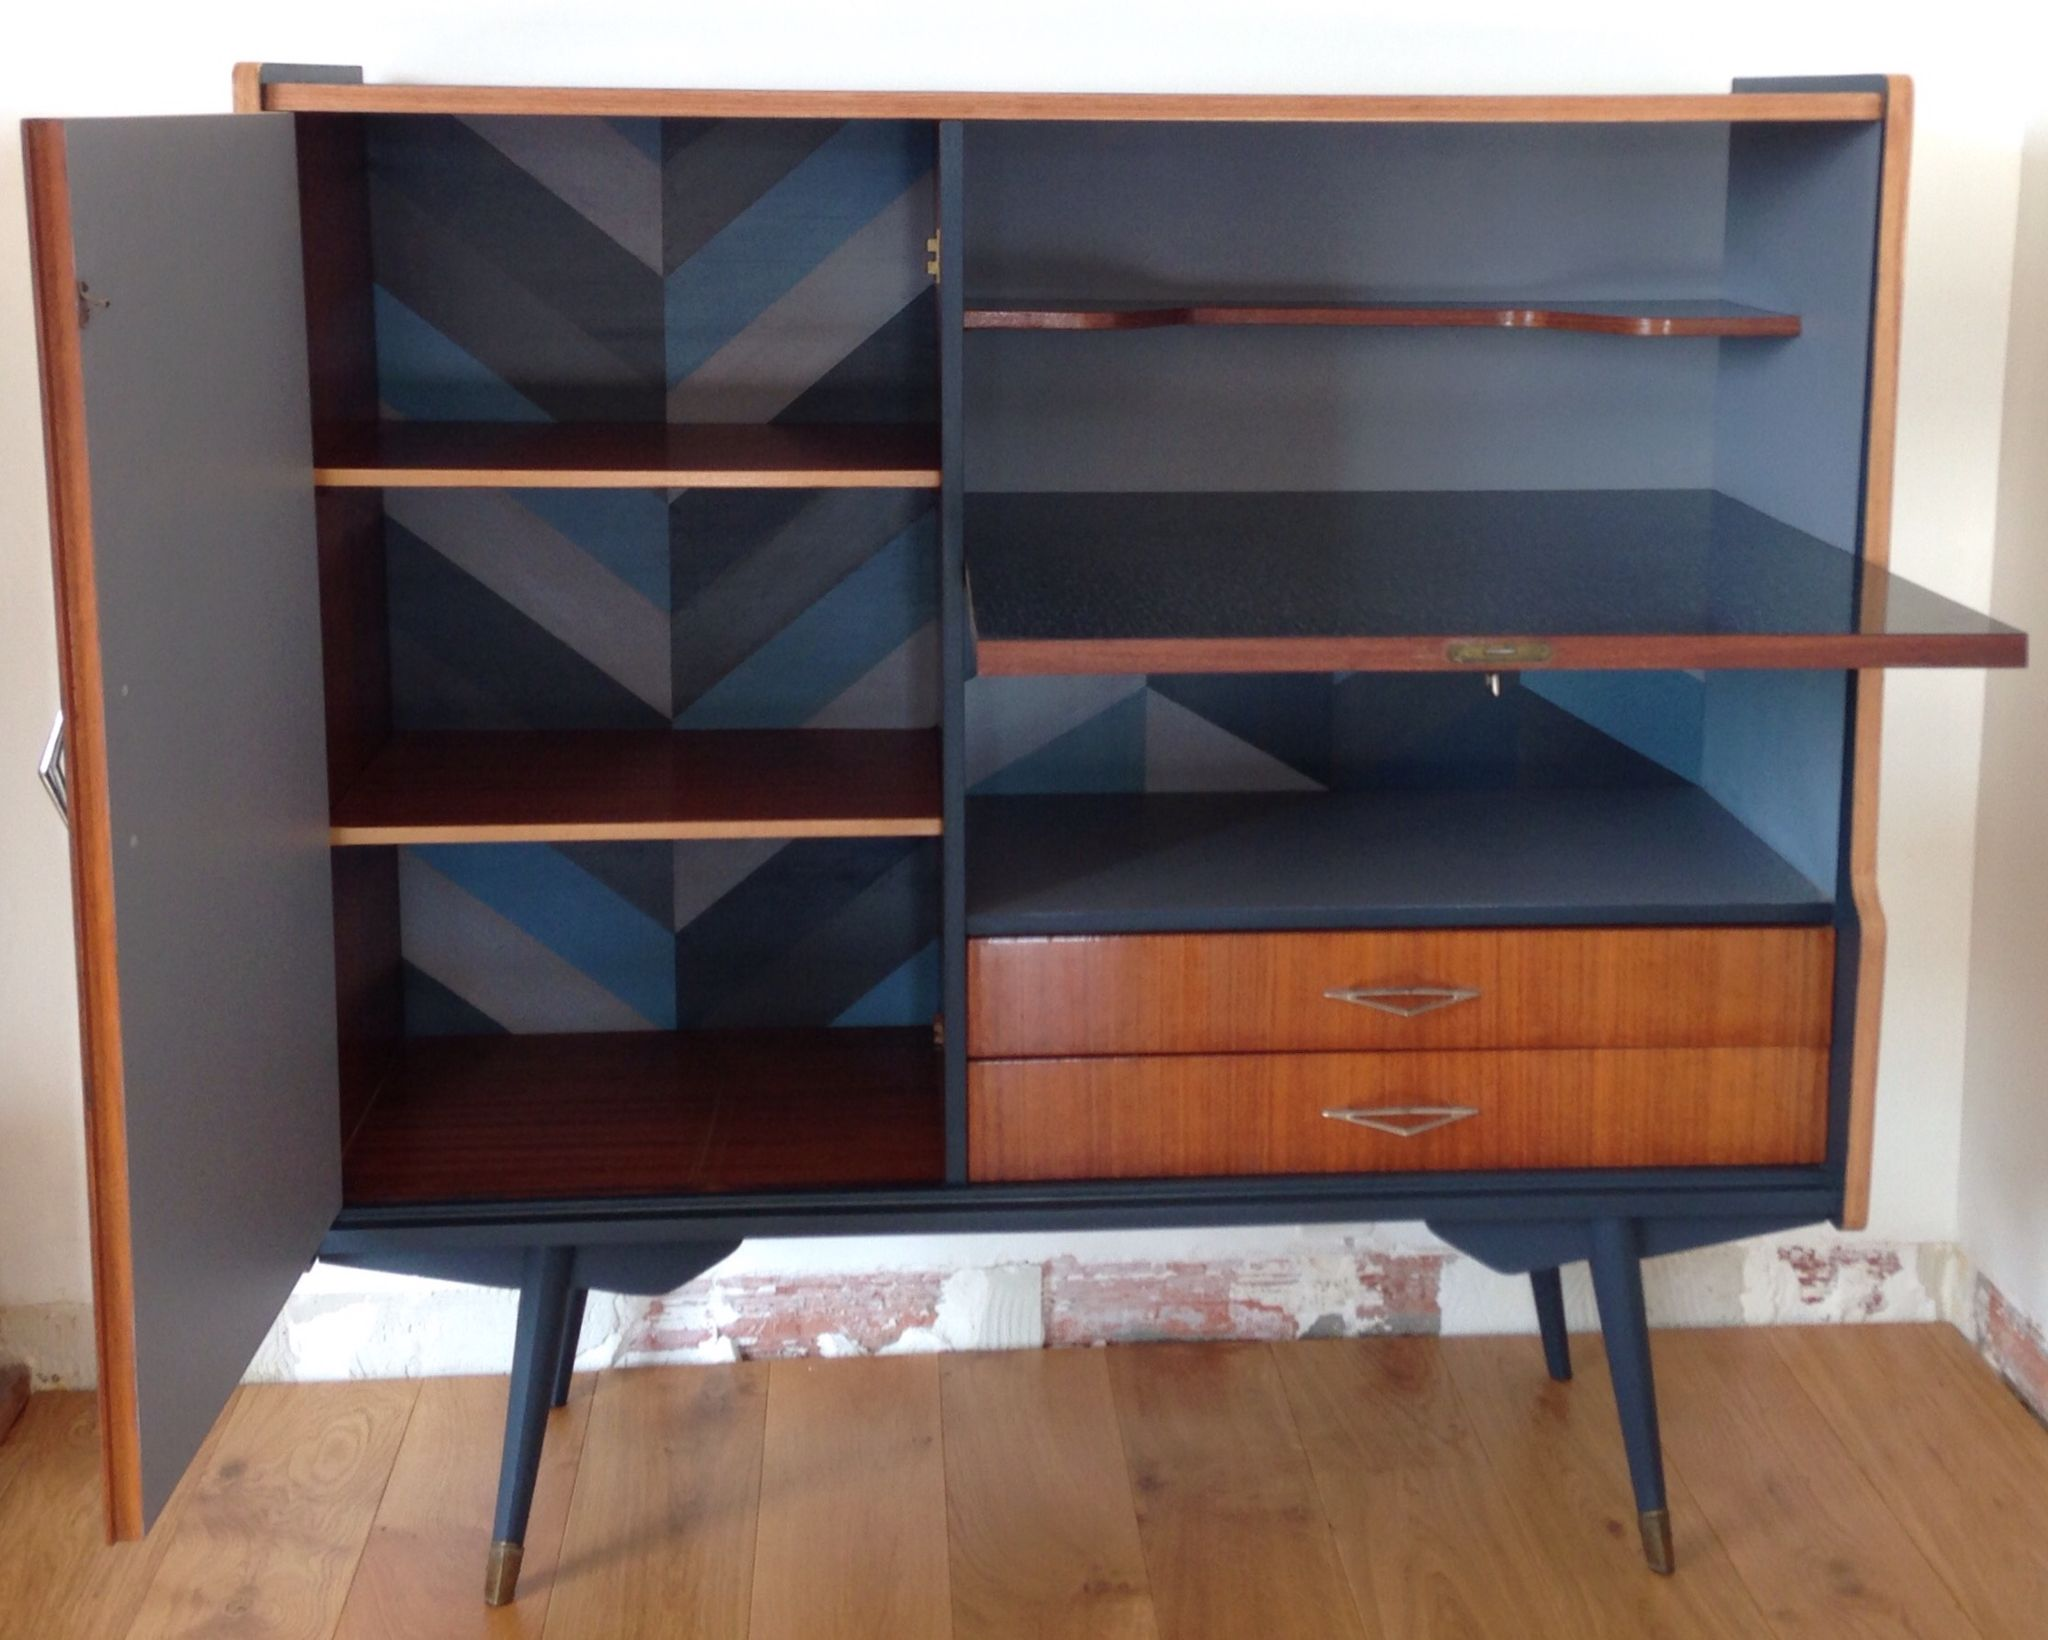 meuble de rangement mini bar meubles r nov s vintage 50. Black Bedroom Furniture Sets. Home Design Ideas